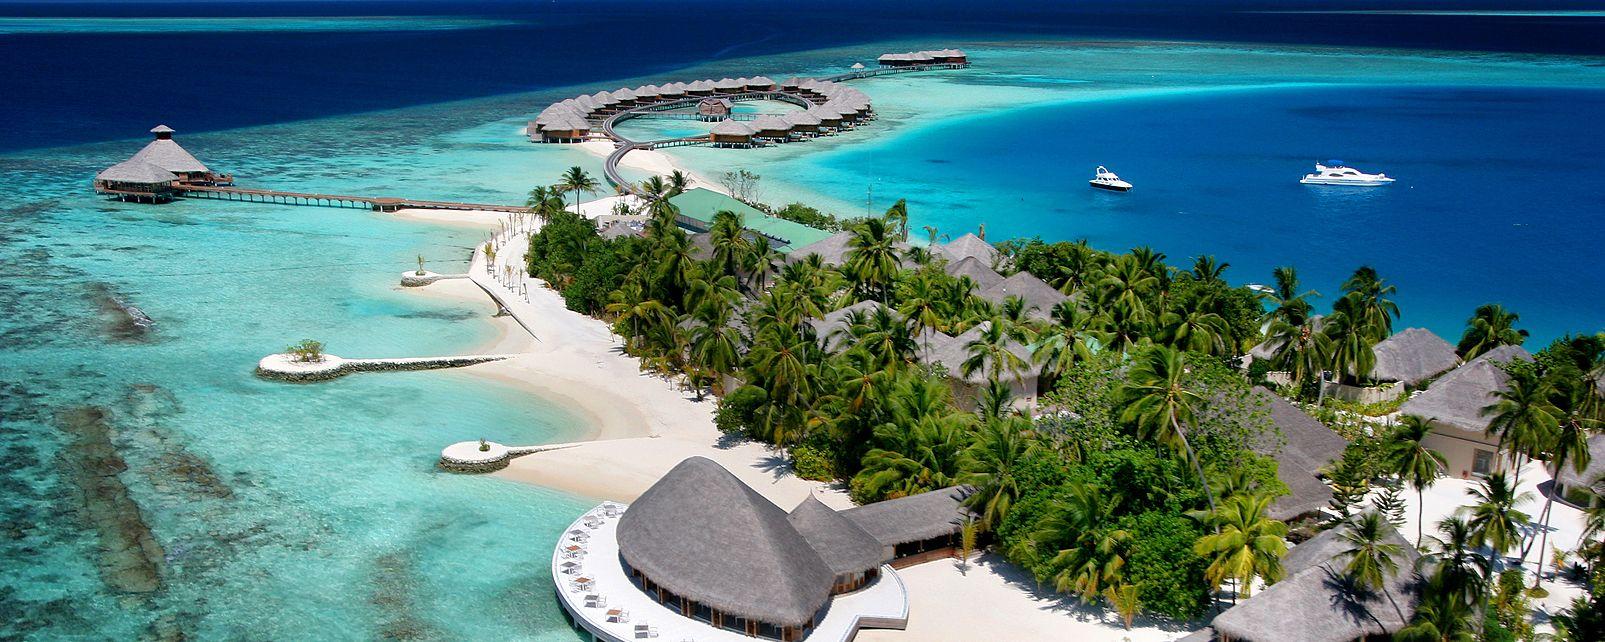 Hotel Huvafen Fushi Maldives